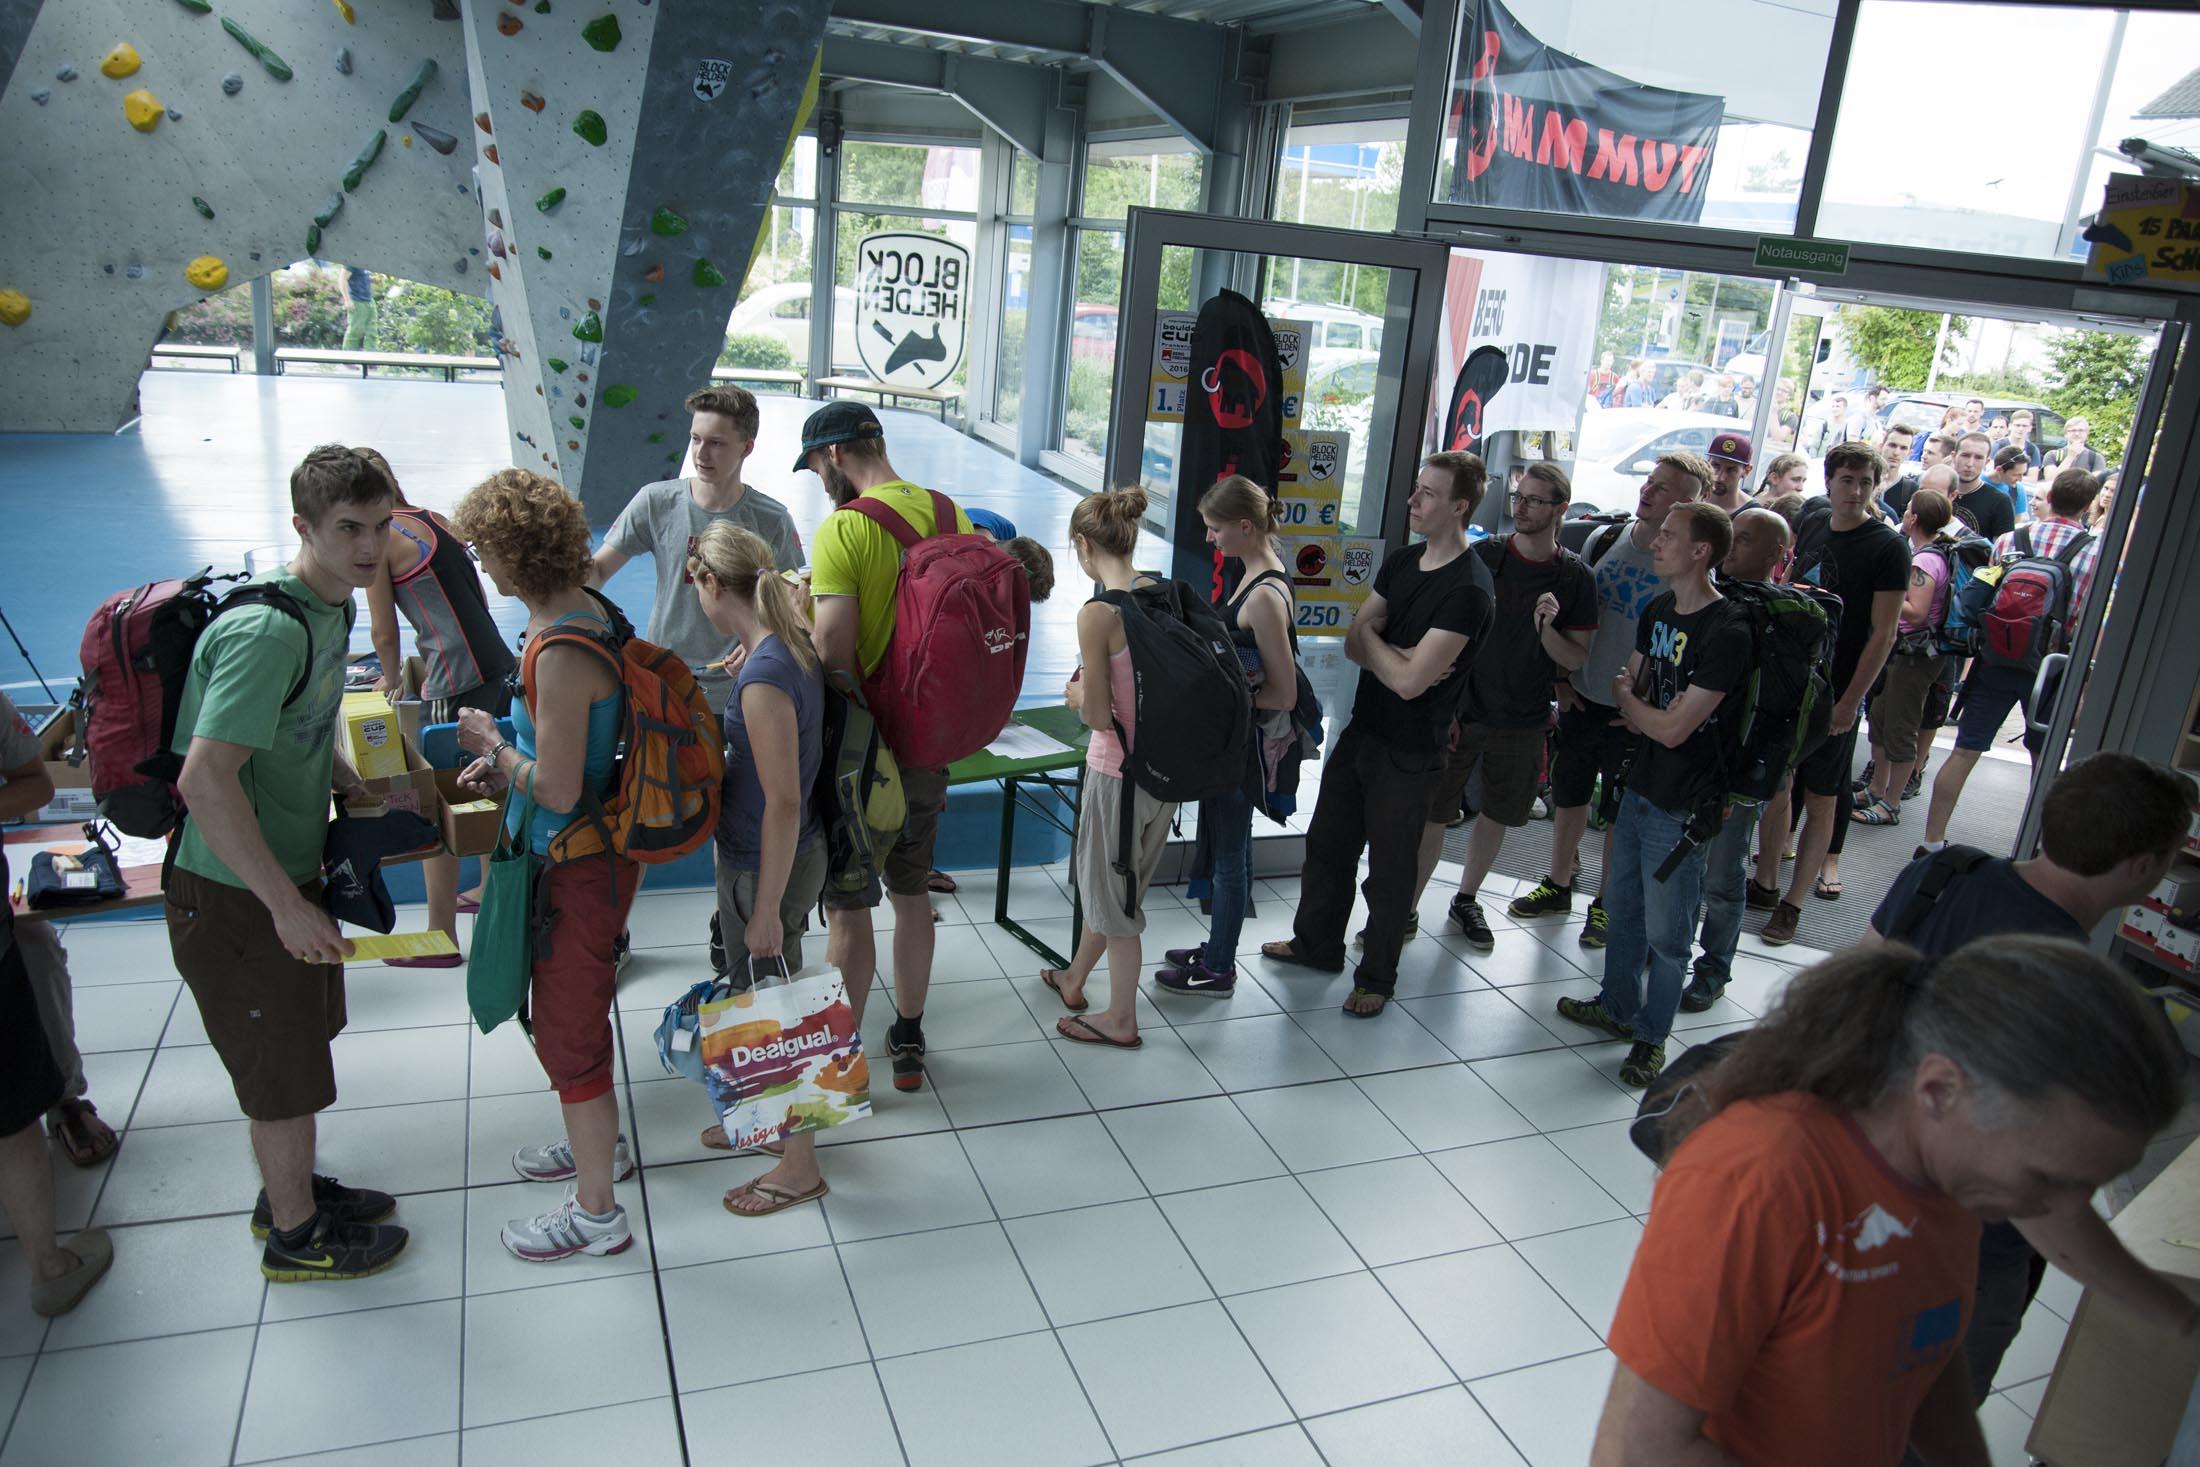 Registration internationaler bouldercup Frankenjura 2016, BLOCKHELDEN Erlangen, Mammut, Bergfreunde.de, Boulderwettkampf07092016078